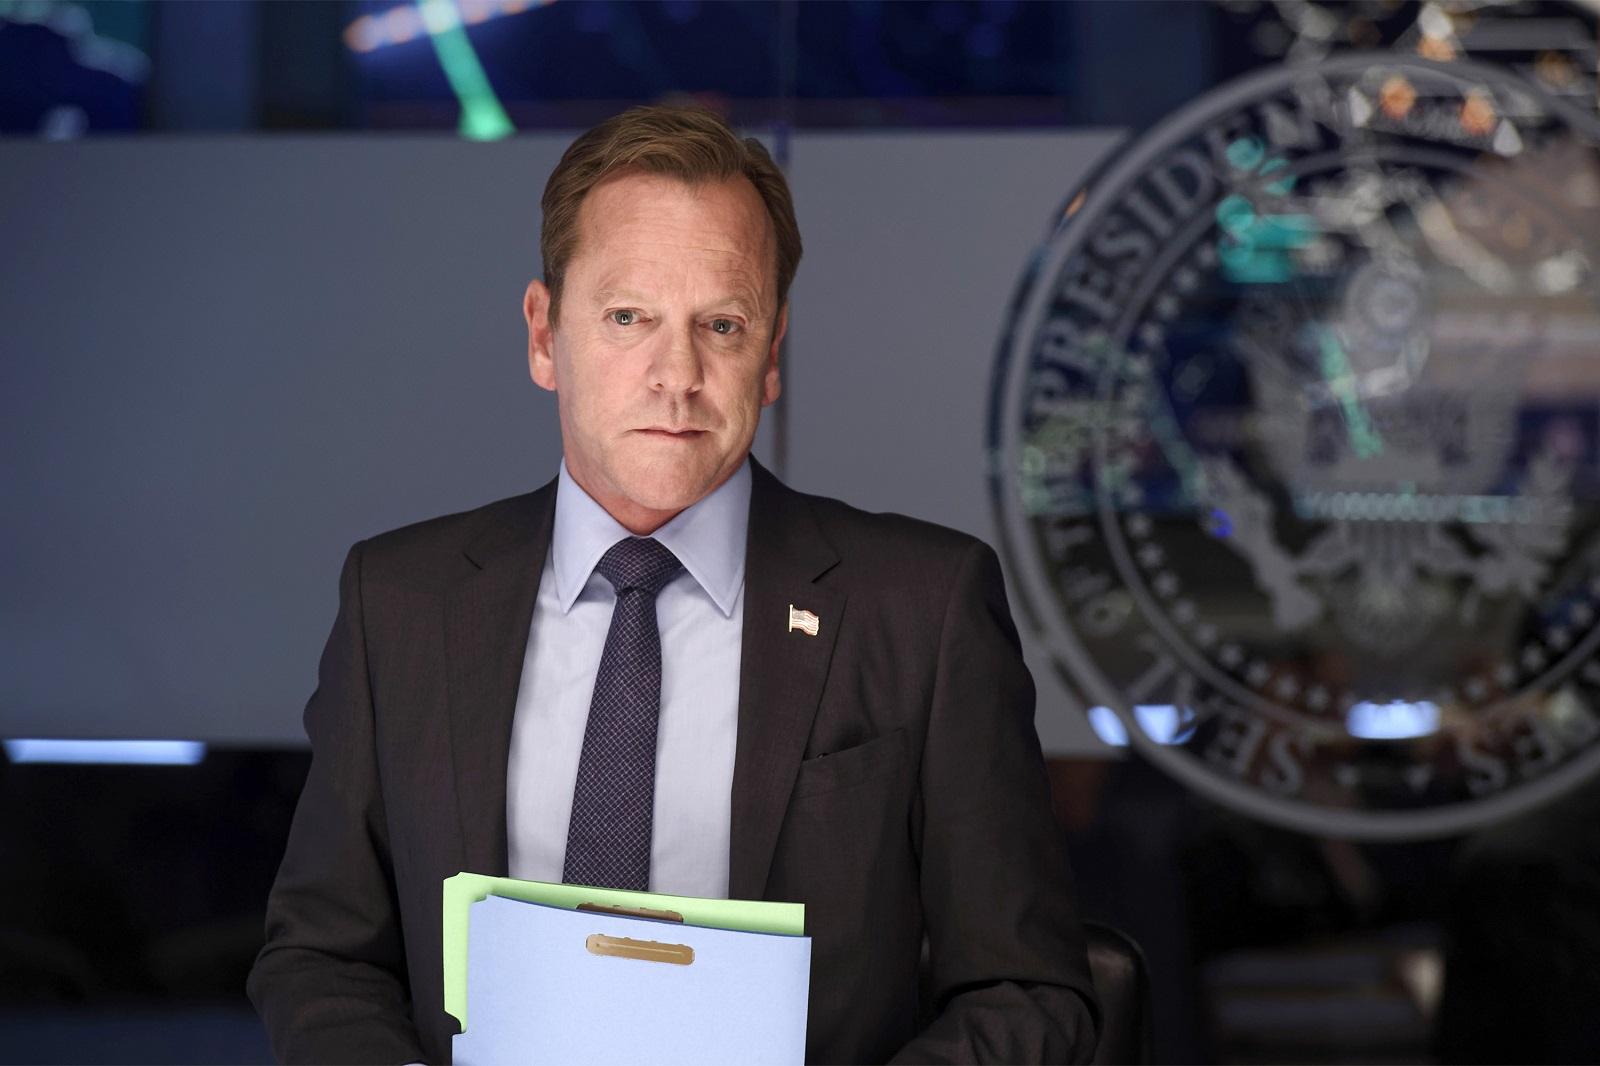 Kiefer Sutherland returns Wednesday as President Tom Kirkman on ABCs Designated Survivor.